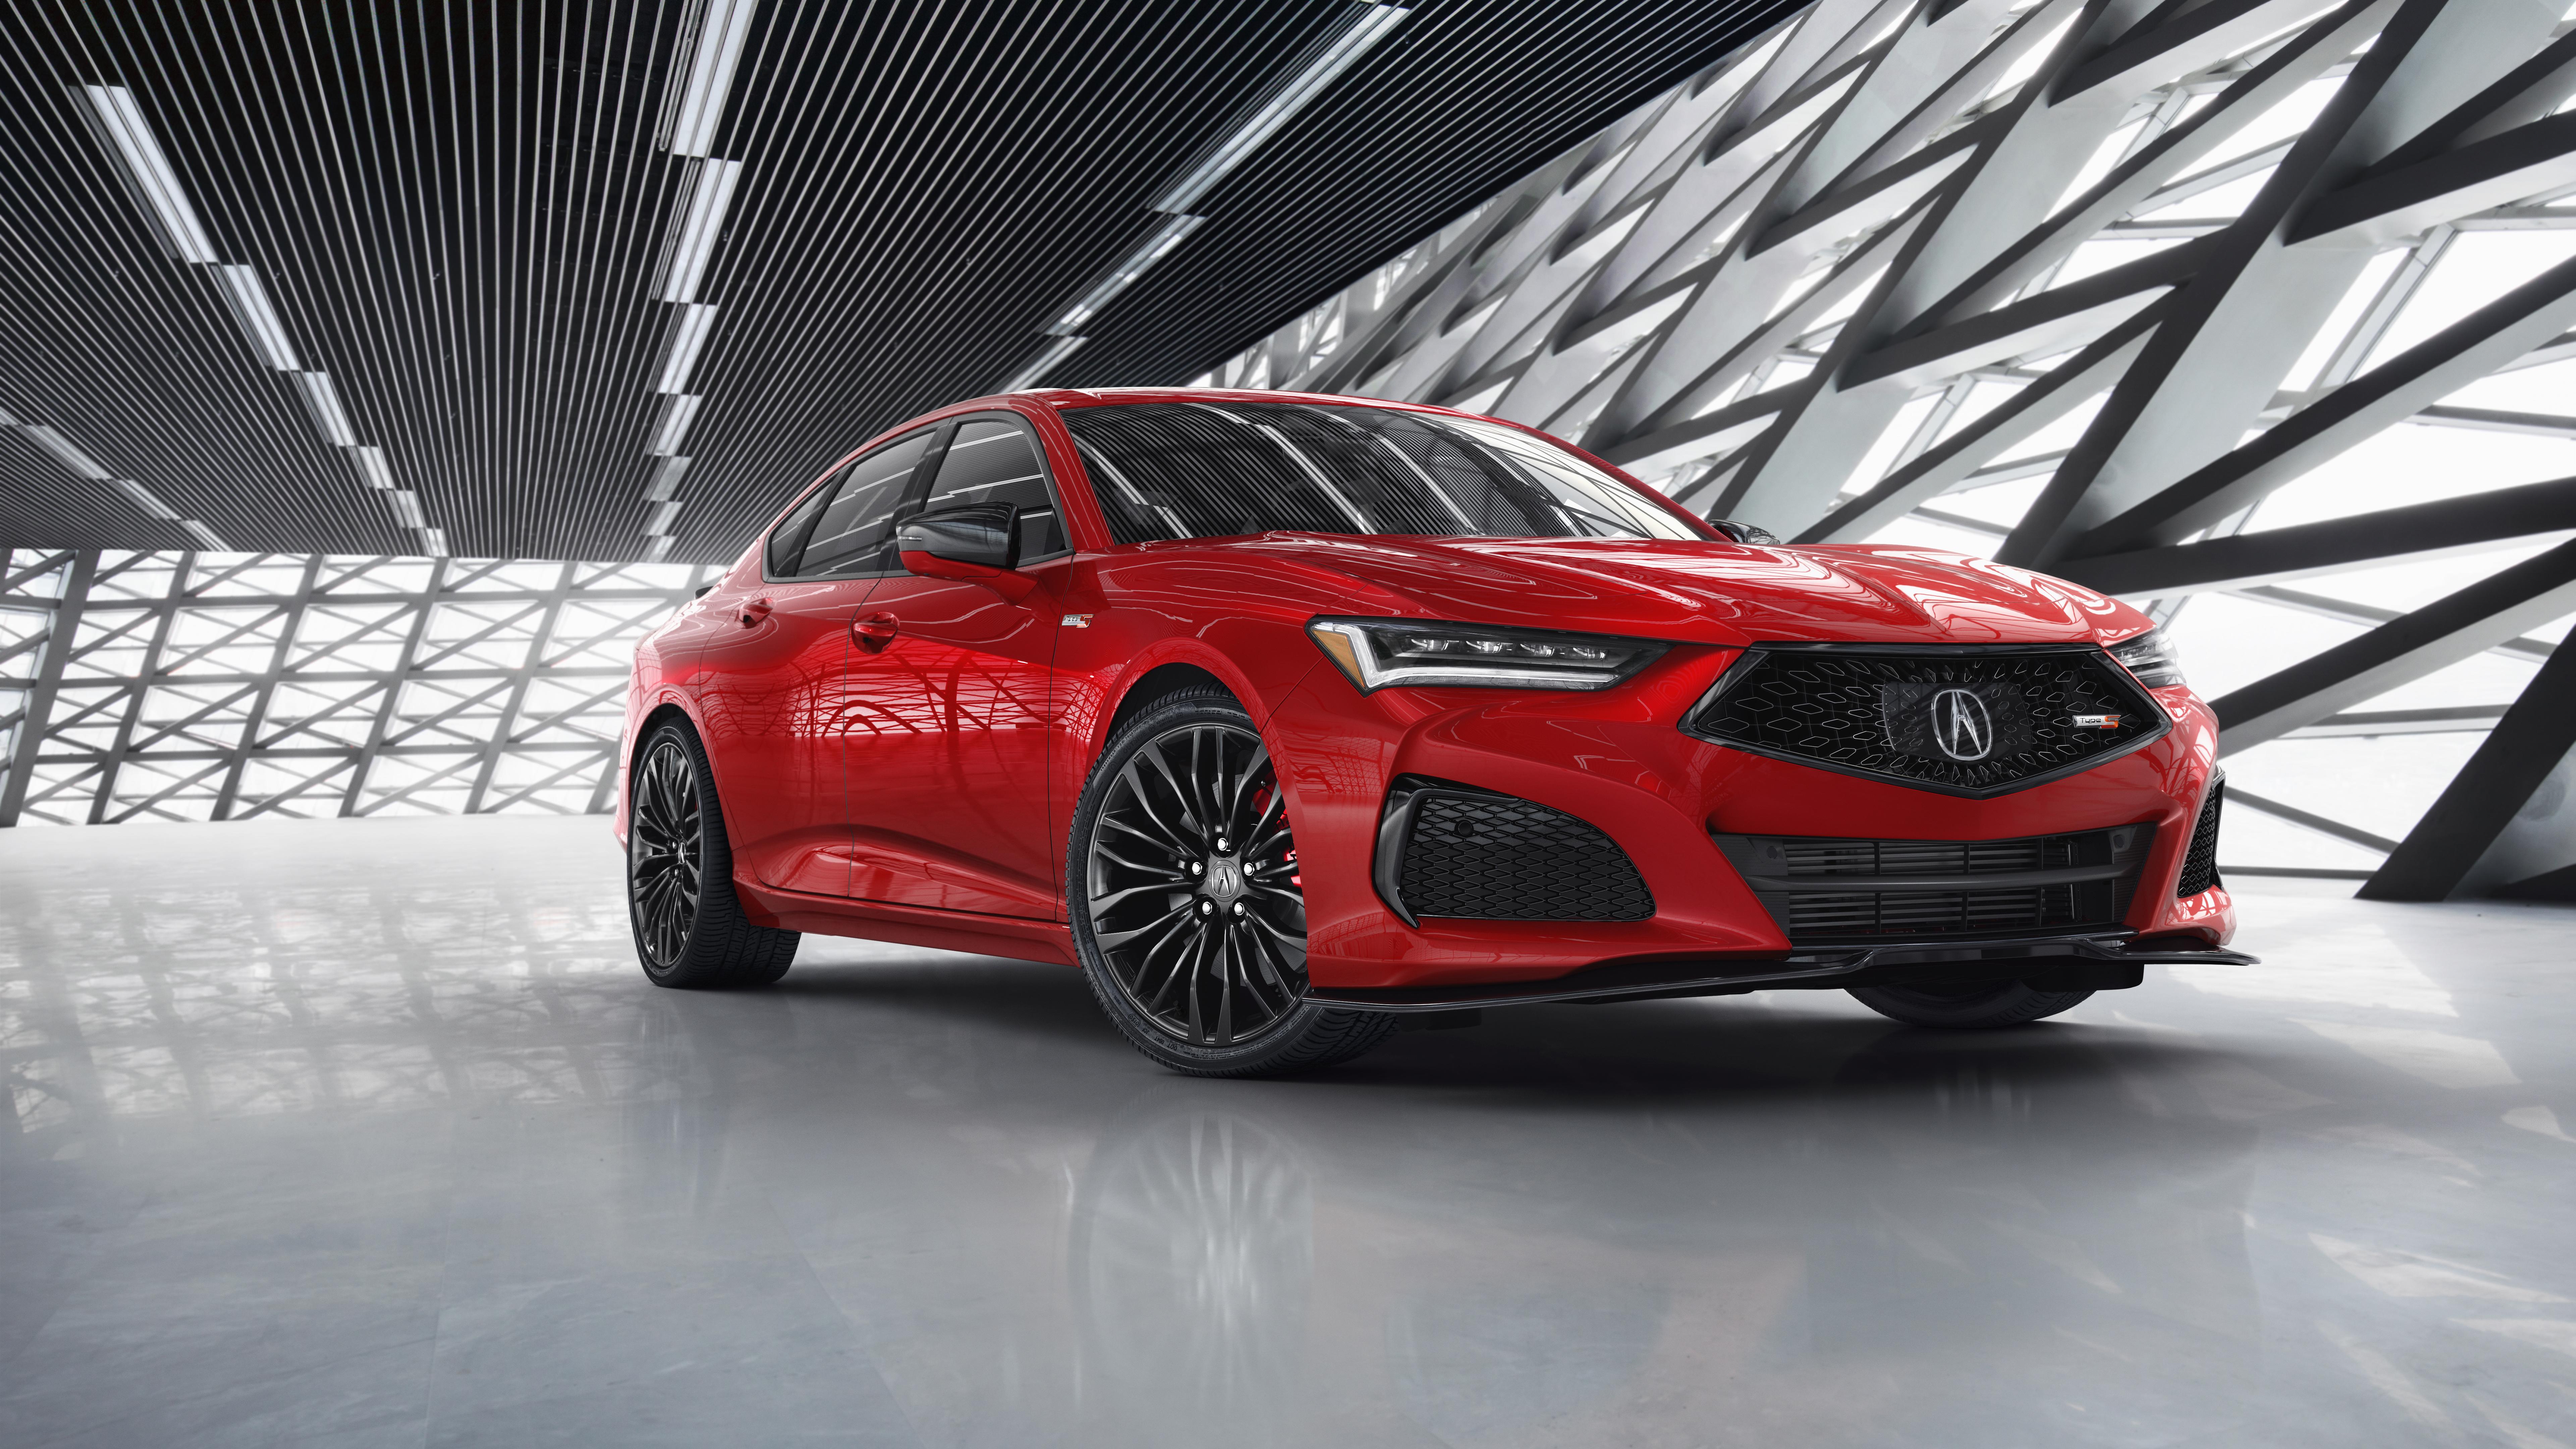 2021 Acura TLX Type S 4K 8K Wallpaper HD Car Wallpapers ID 14895 7680x4320